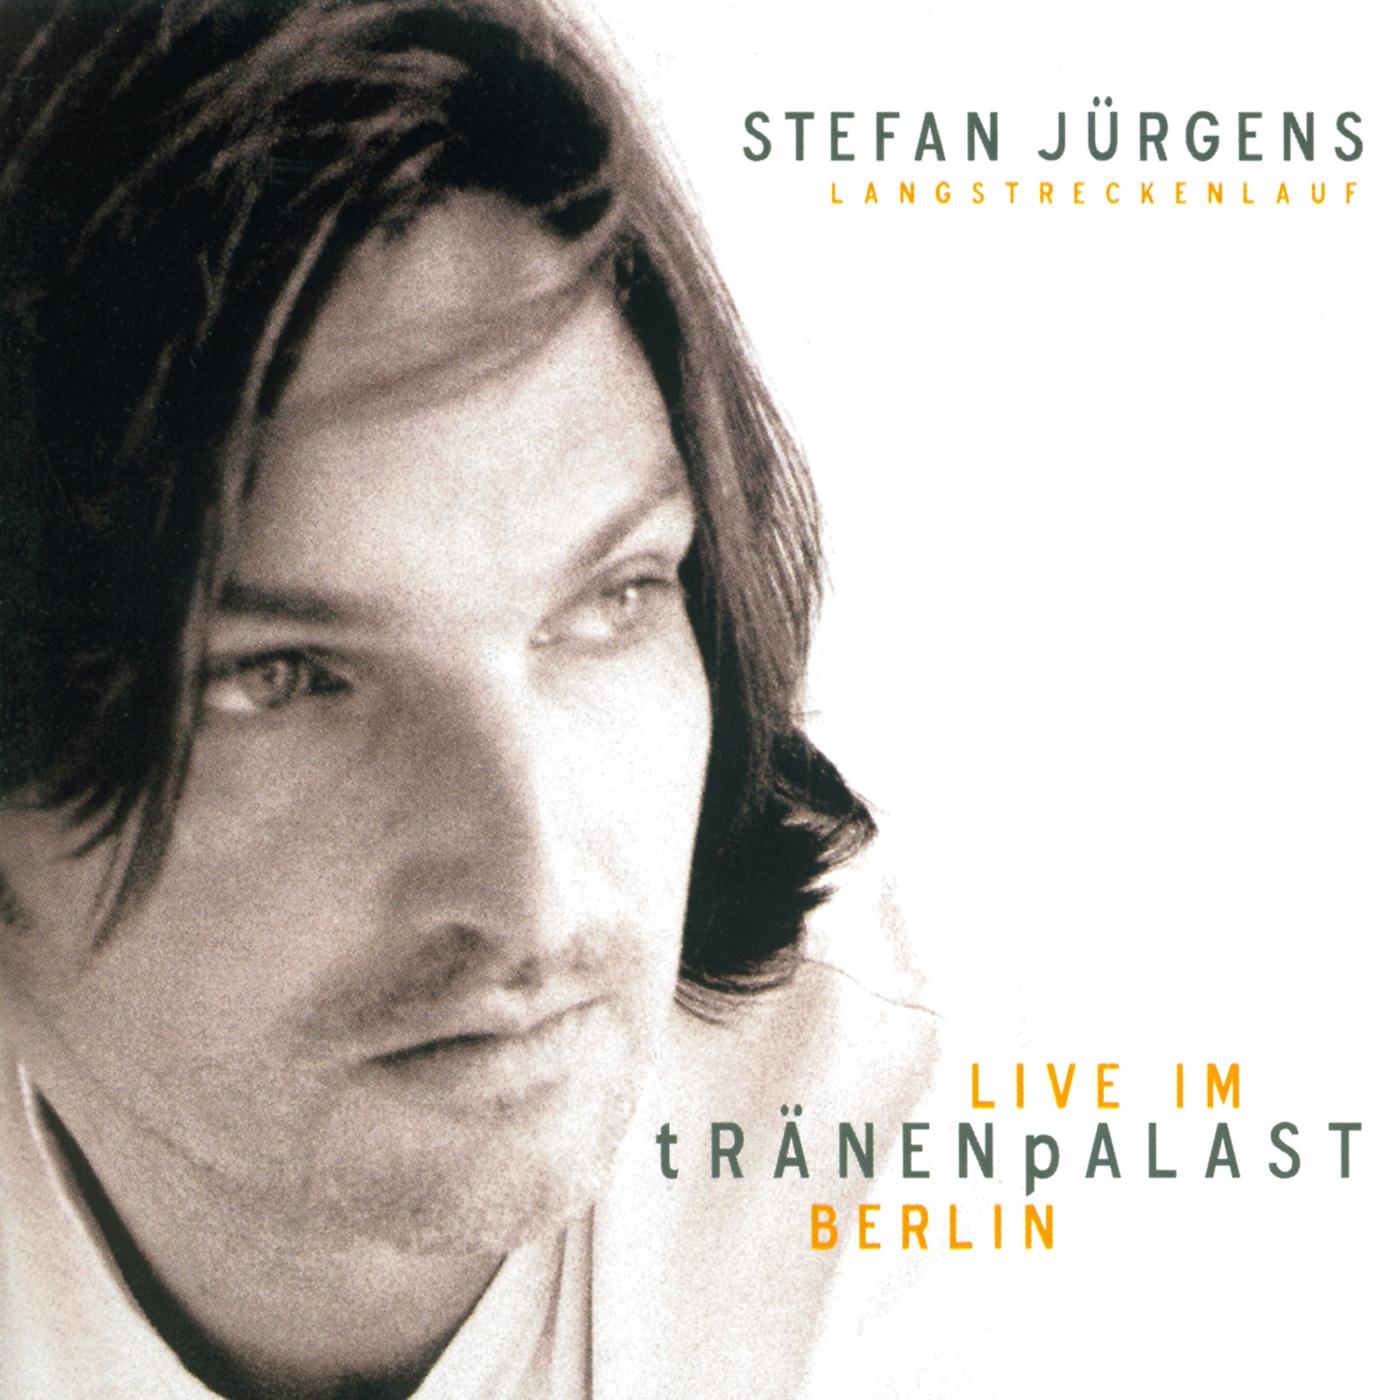 Langstreckenlauf - Live im Tränenpalast - Stefan Jürgens